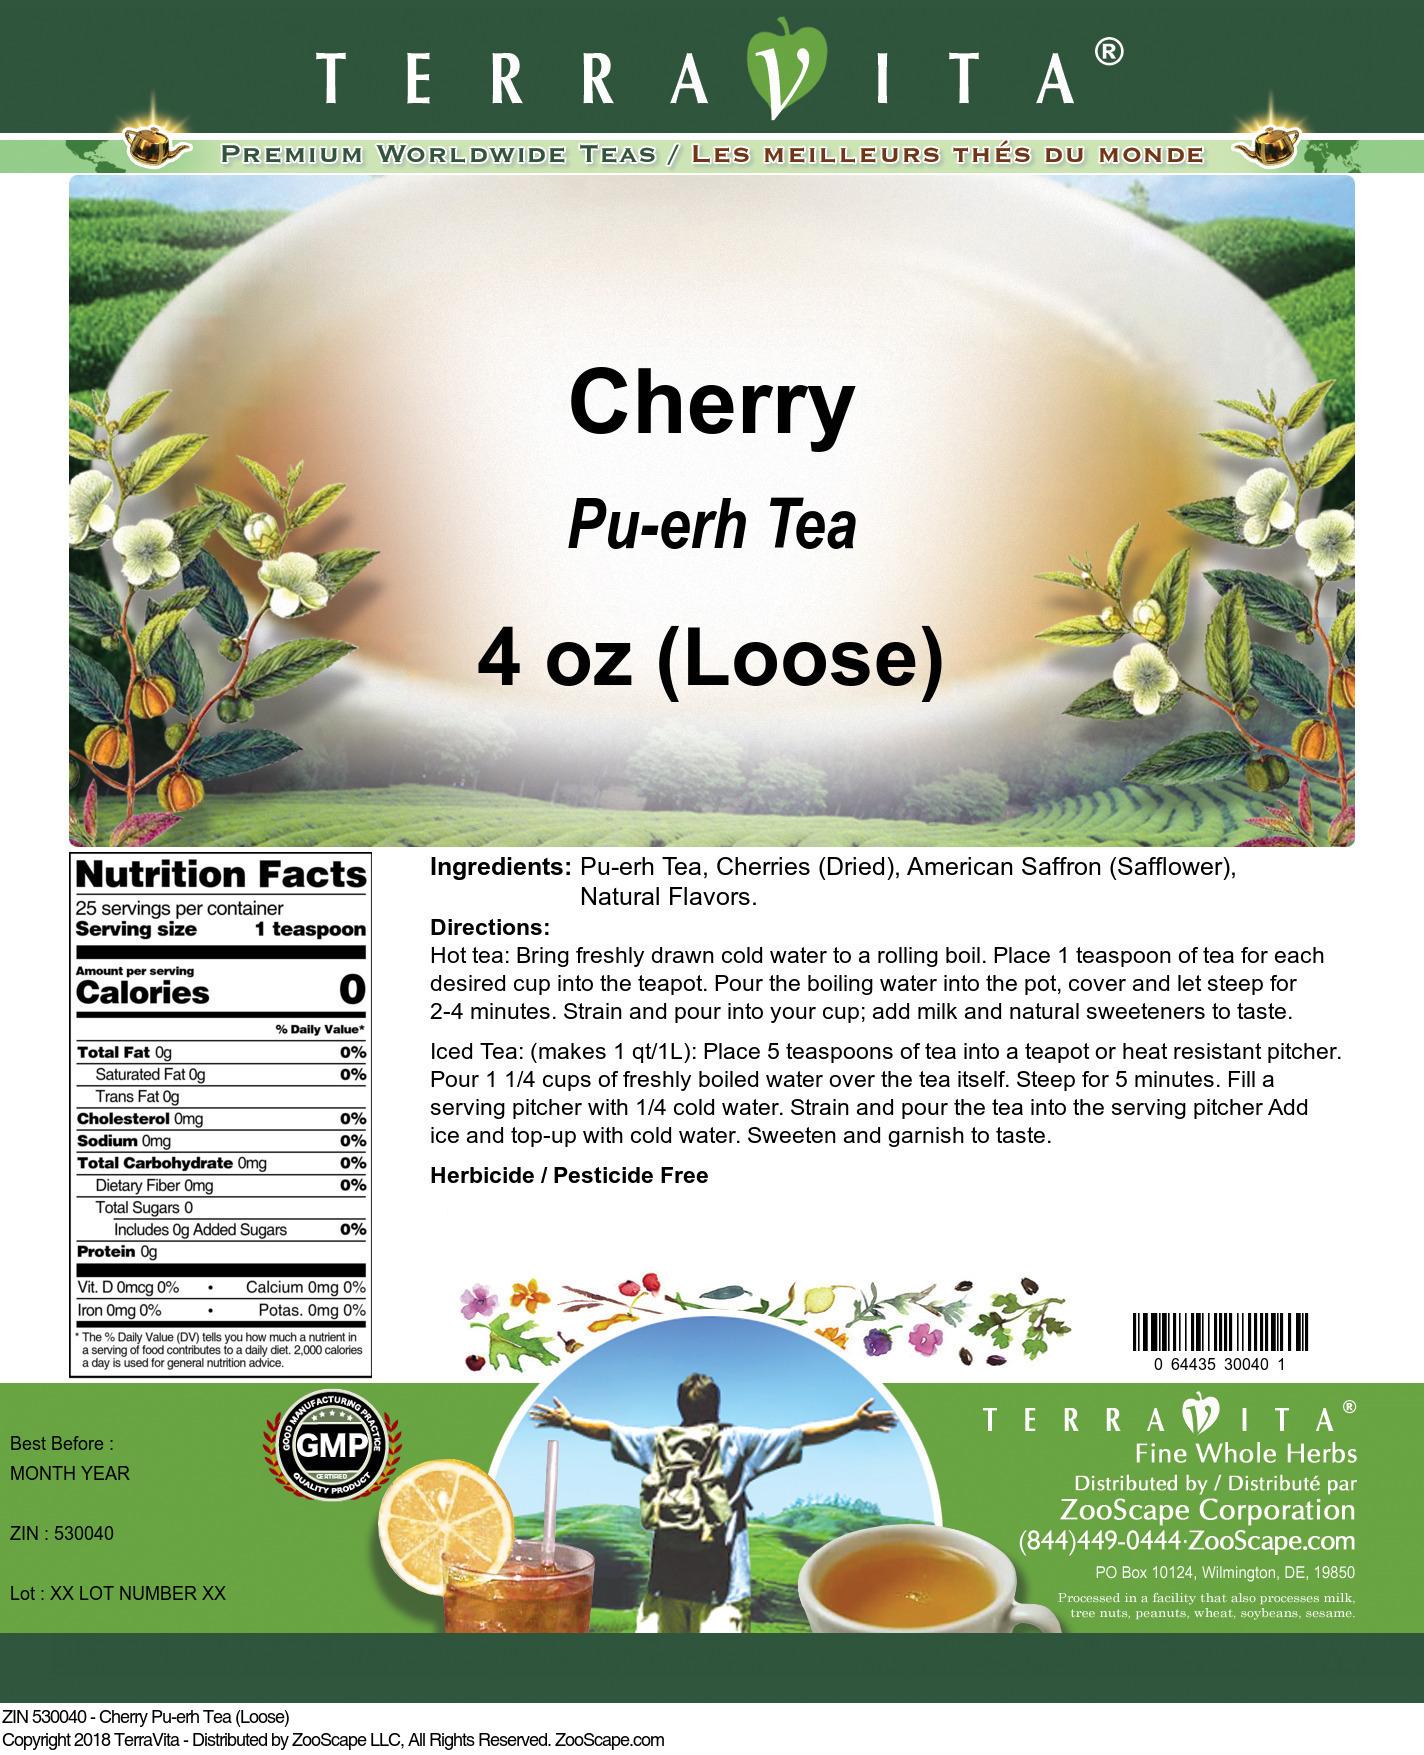 Cherry Pu-erh Tea